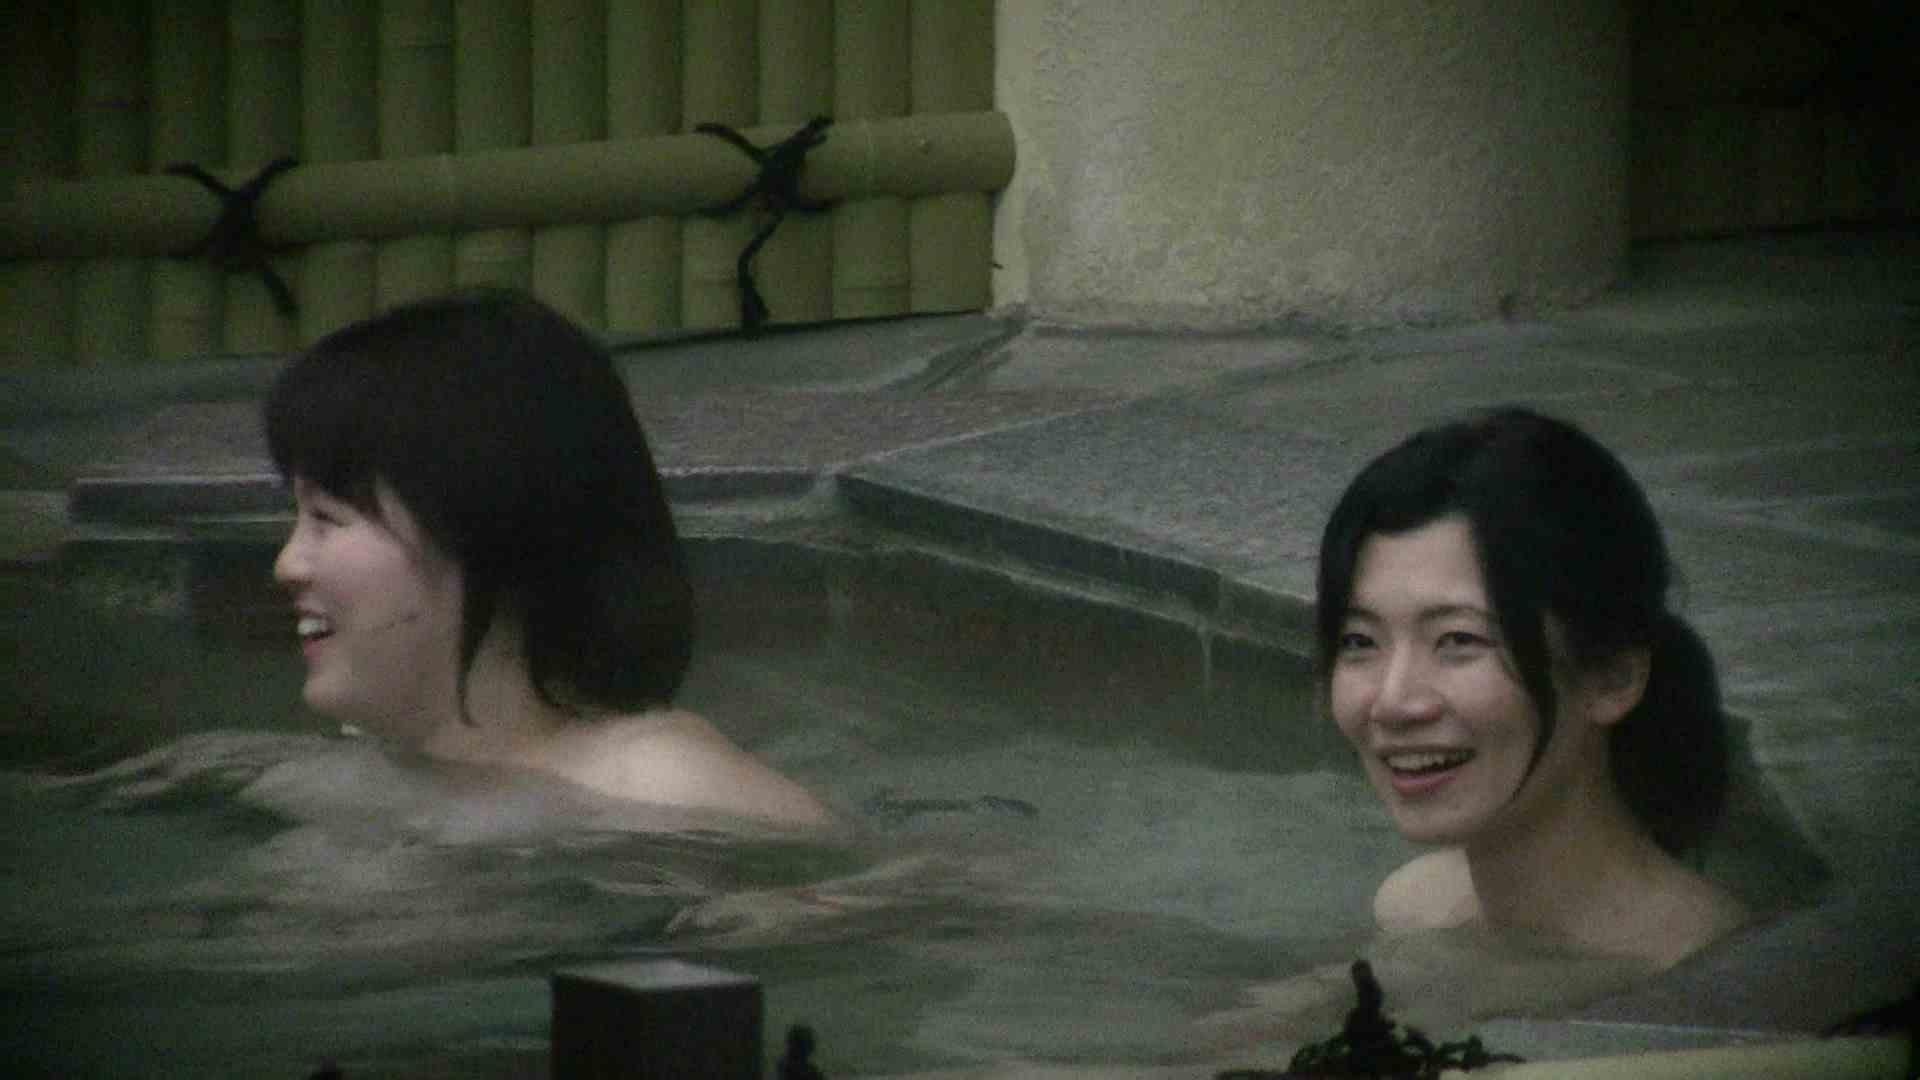 Aquaな露天風呂Vol.539 盗撮  62pic 20